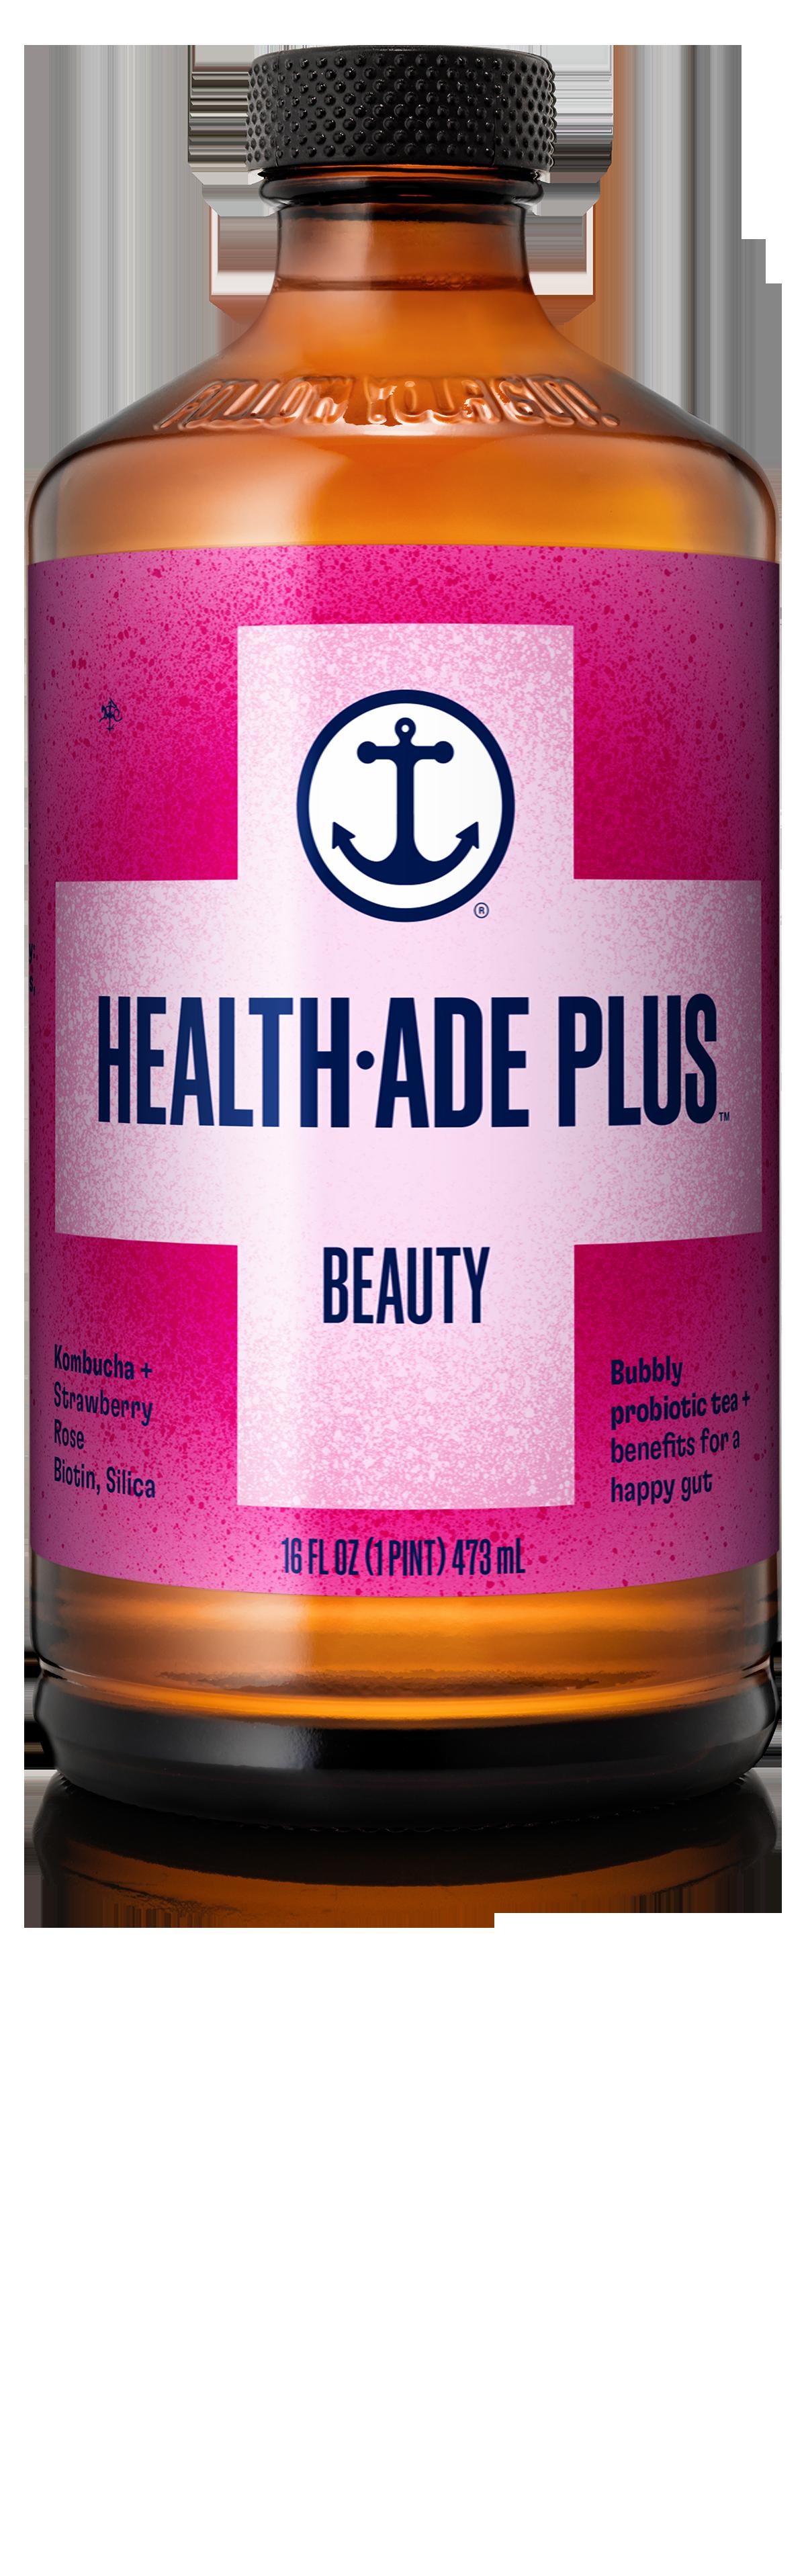 Health-Ade PLUS Beauty